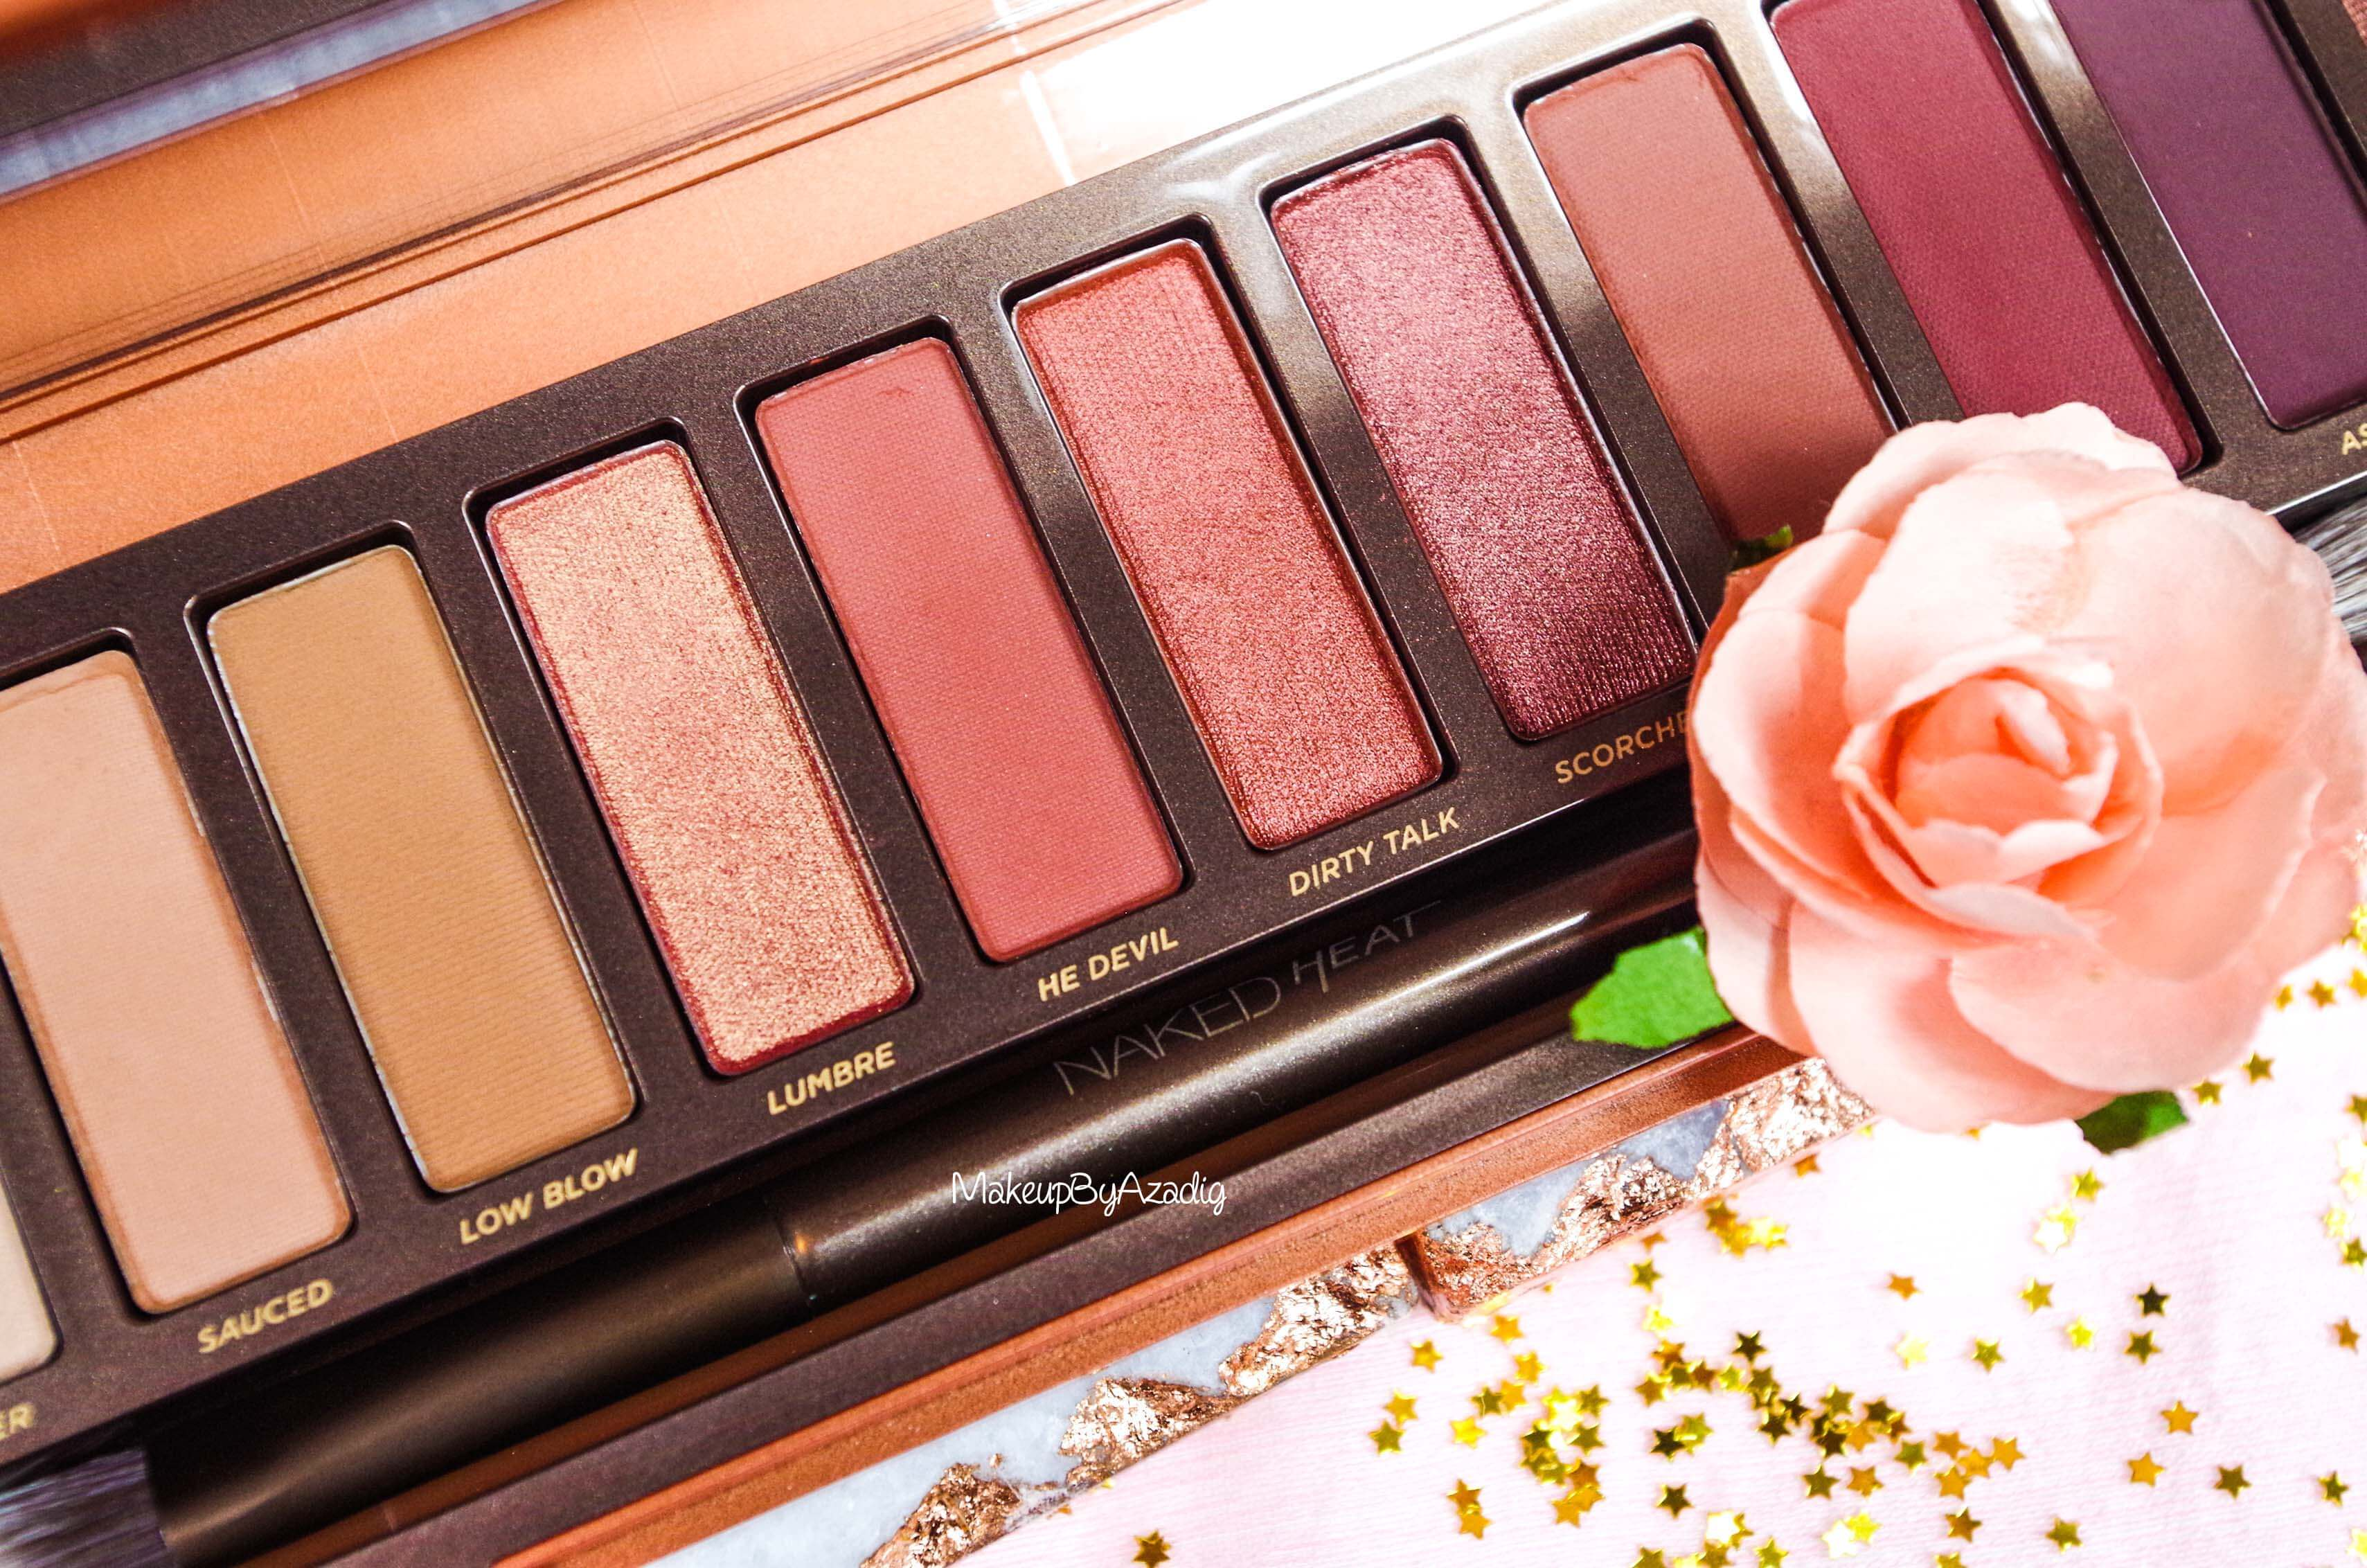 revue-review-nouvelle-palette-naked-heat-urban-decay-sephora-avis-prix-france-makeupbyazadig-swatch-zoom